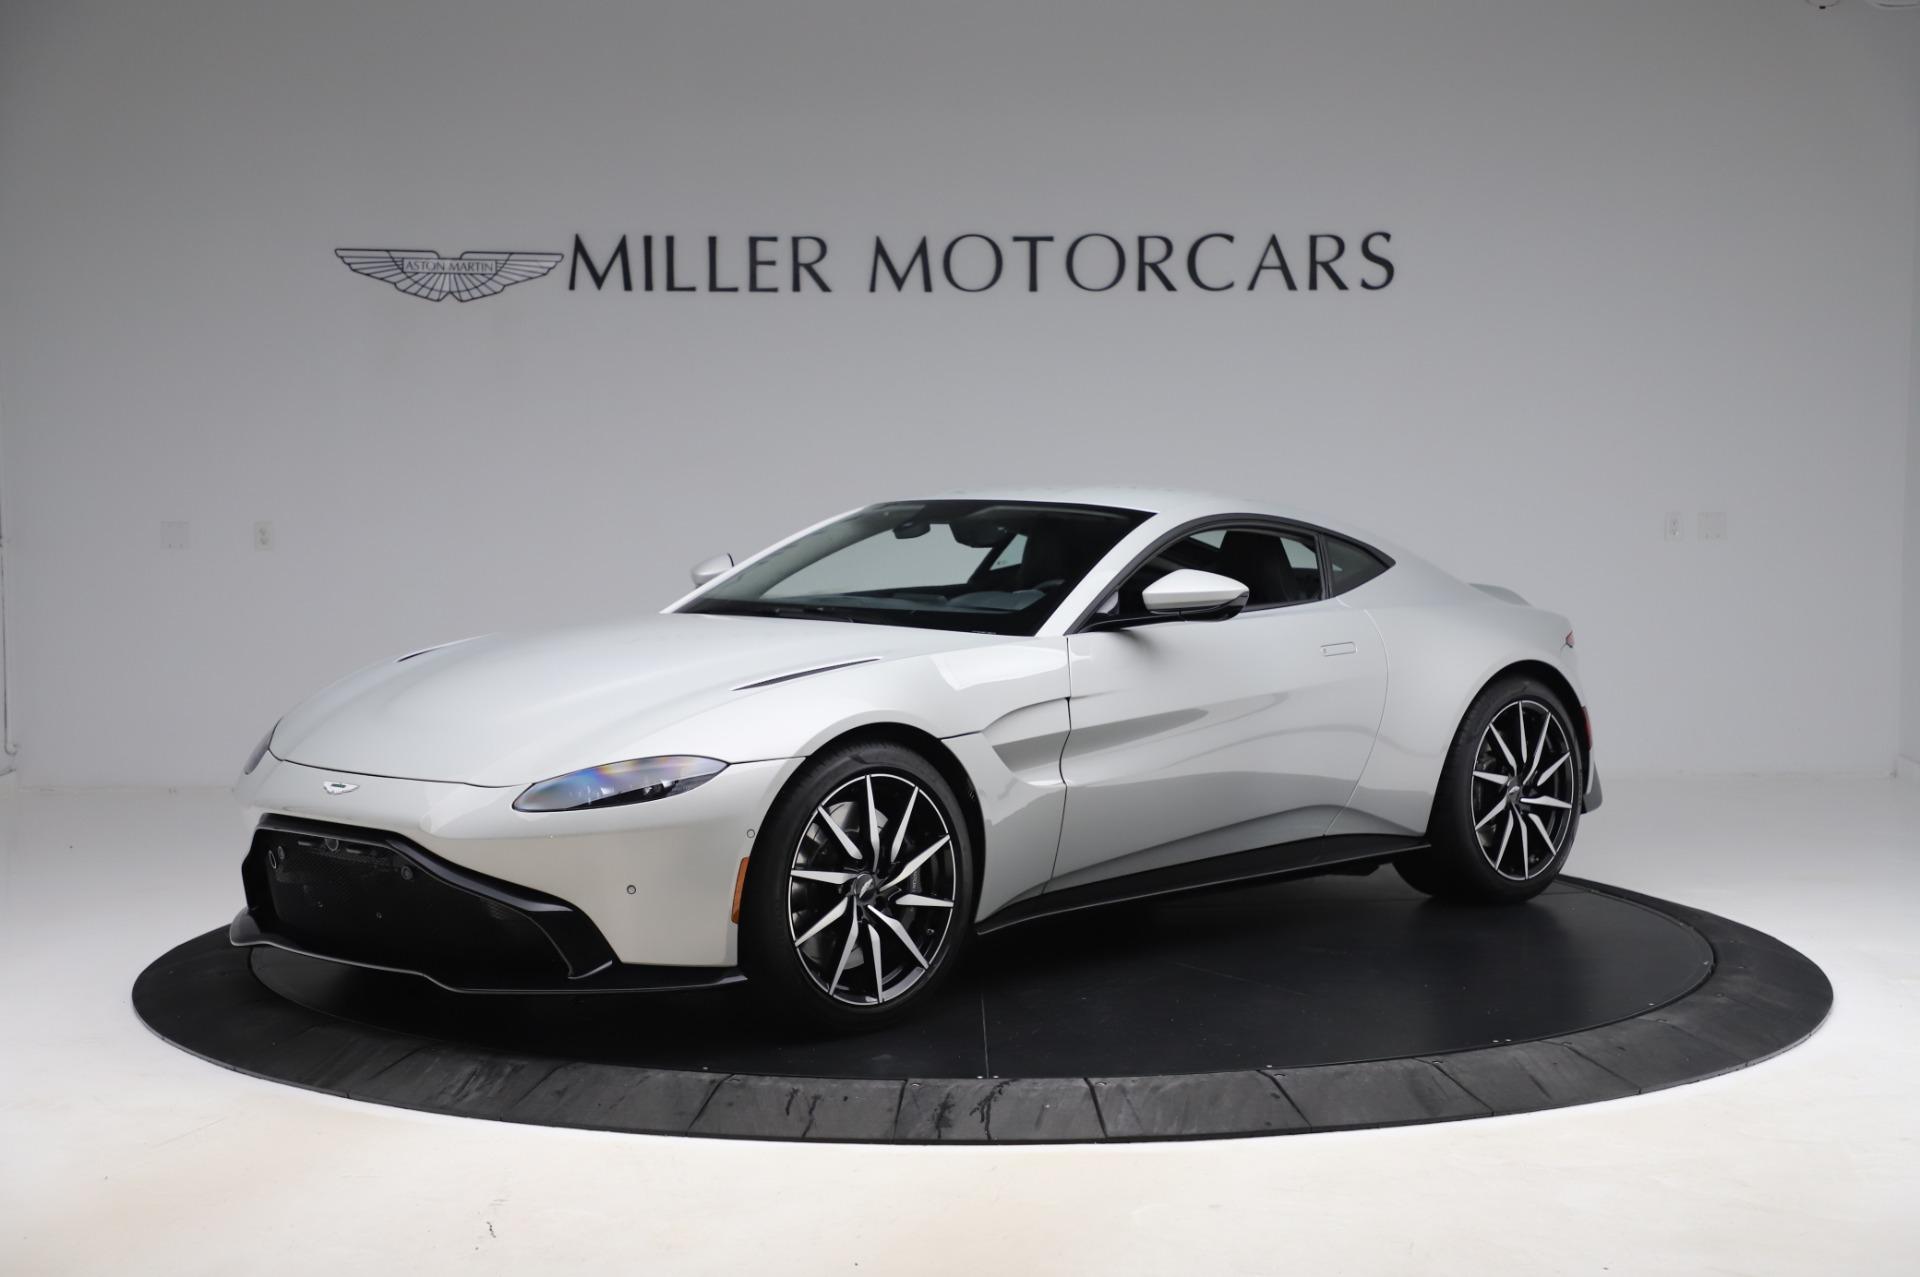 Used 2020 Aston Martin Vantage Coupe for sale $149,800 at Alfa Romeo of Westport in Westport CT 06880 1